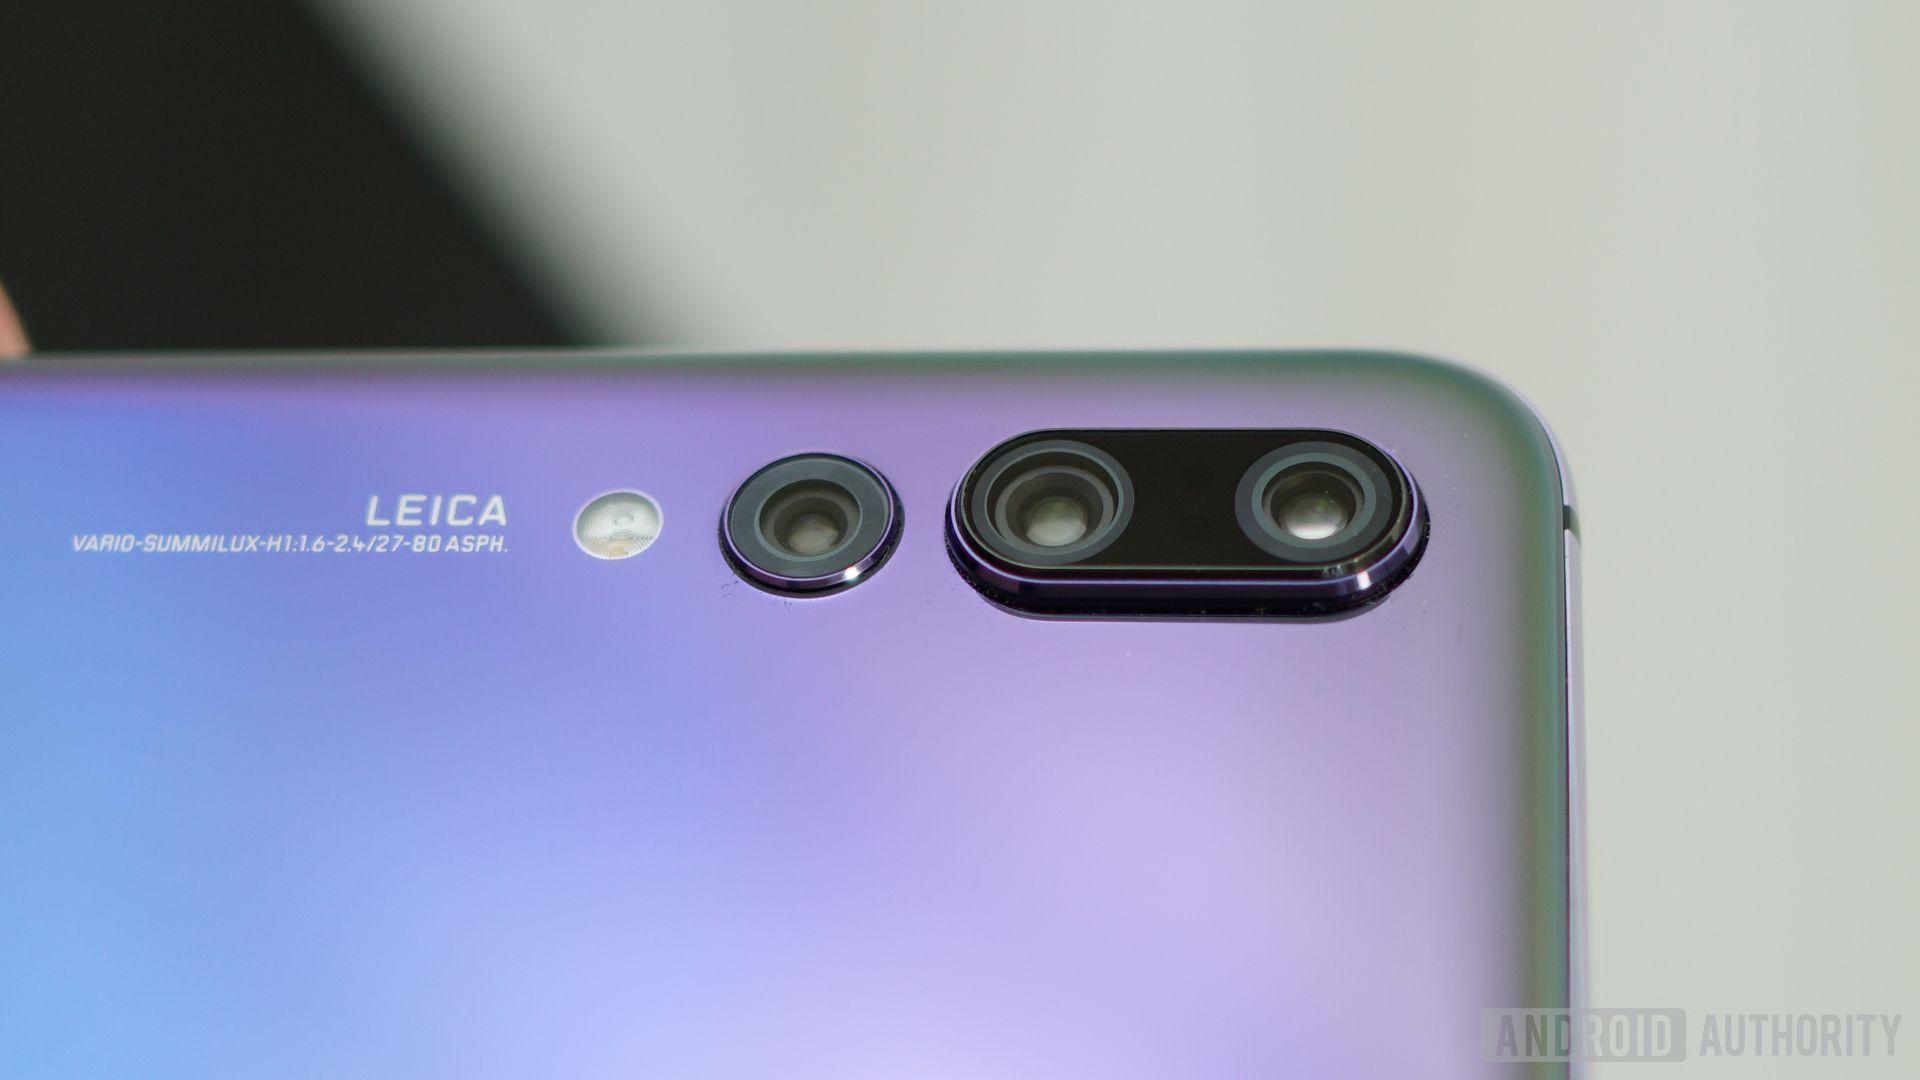 Huawei p20 pro update brings galaxy s9like automatic slo